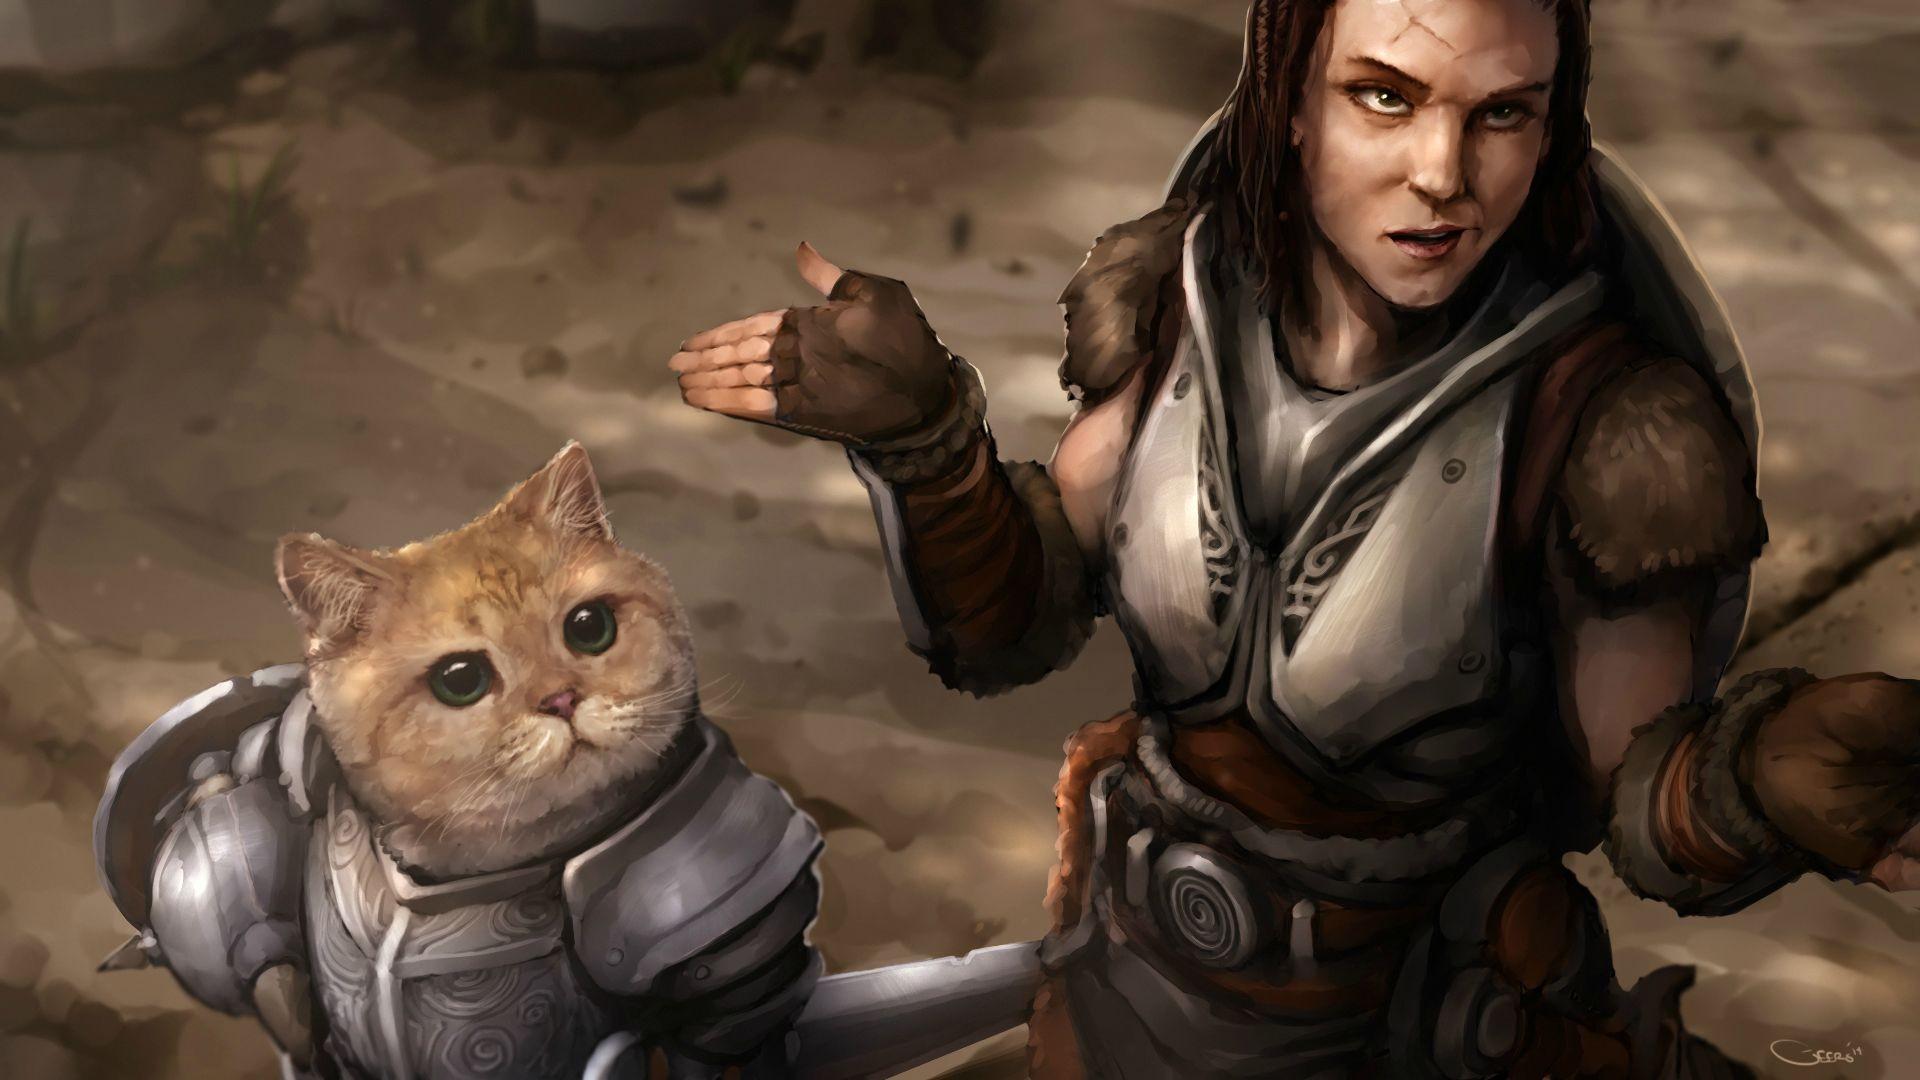 the elder scrolls v skyrim, игры, кот